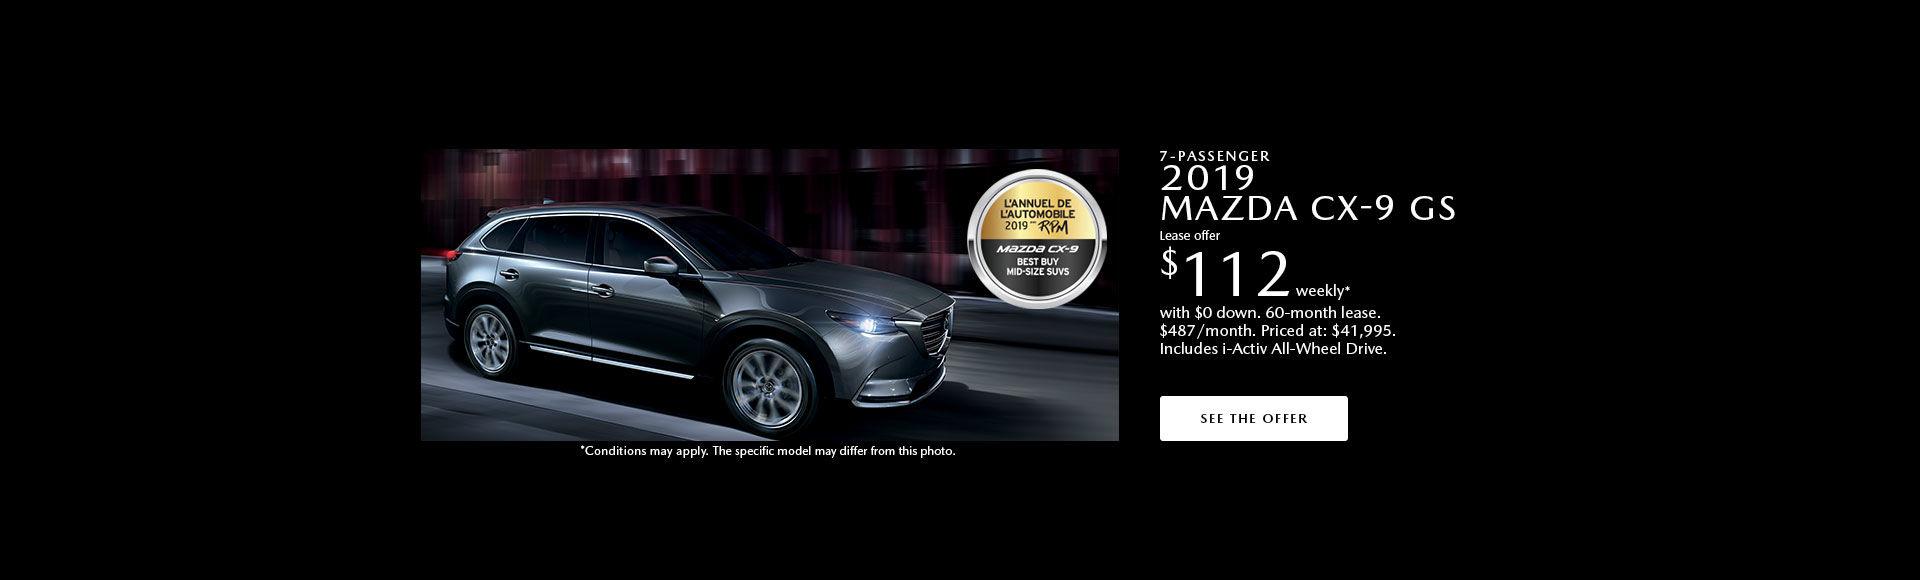 Get the 2019 Mazda CX-9